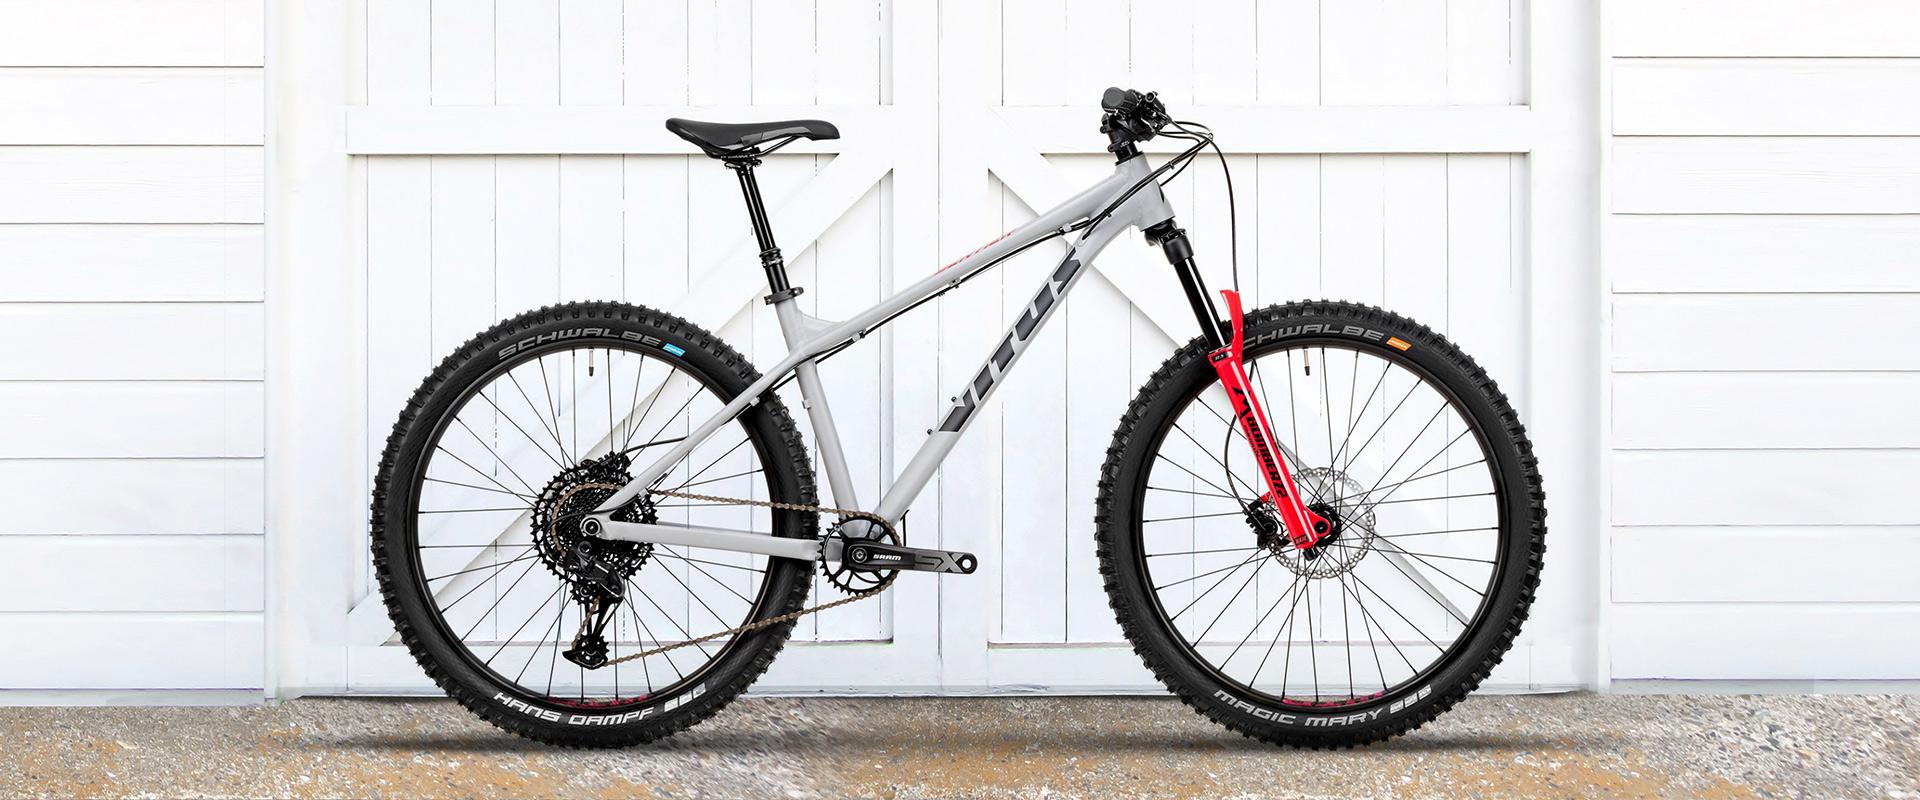 Sentier 27 VR Bike SX Eagle 1x12